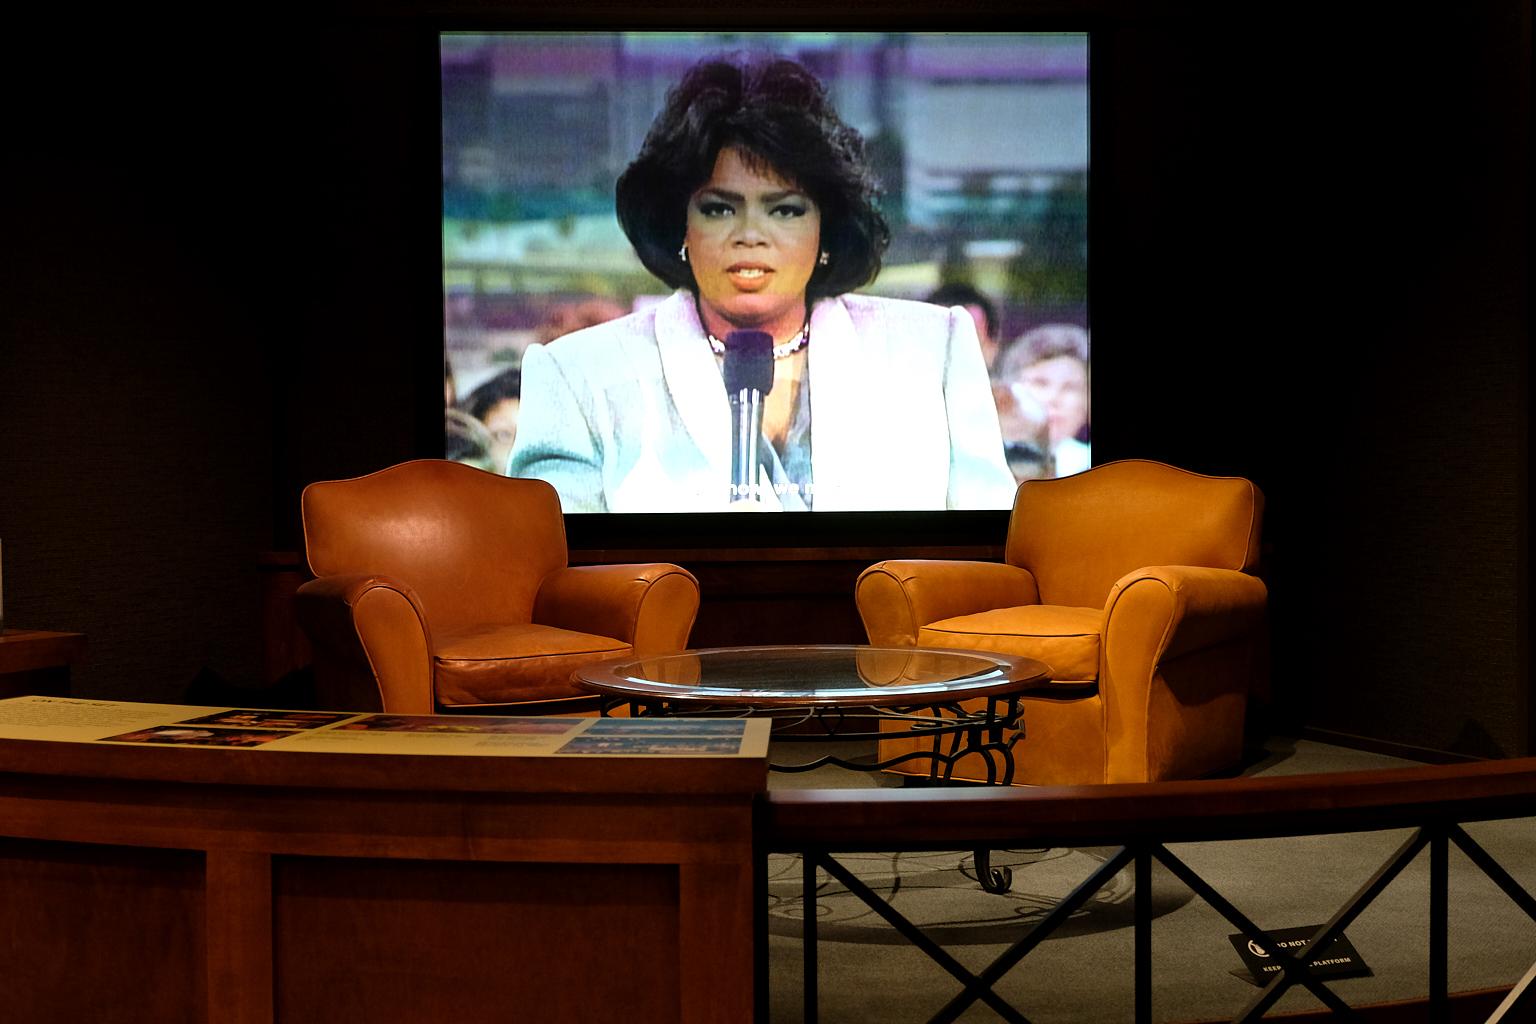 NMAAHC_Oprah_Exhibit_2018-09-26-097.jpg